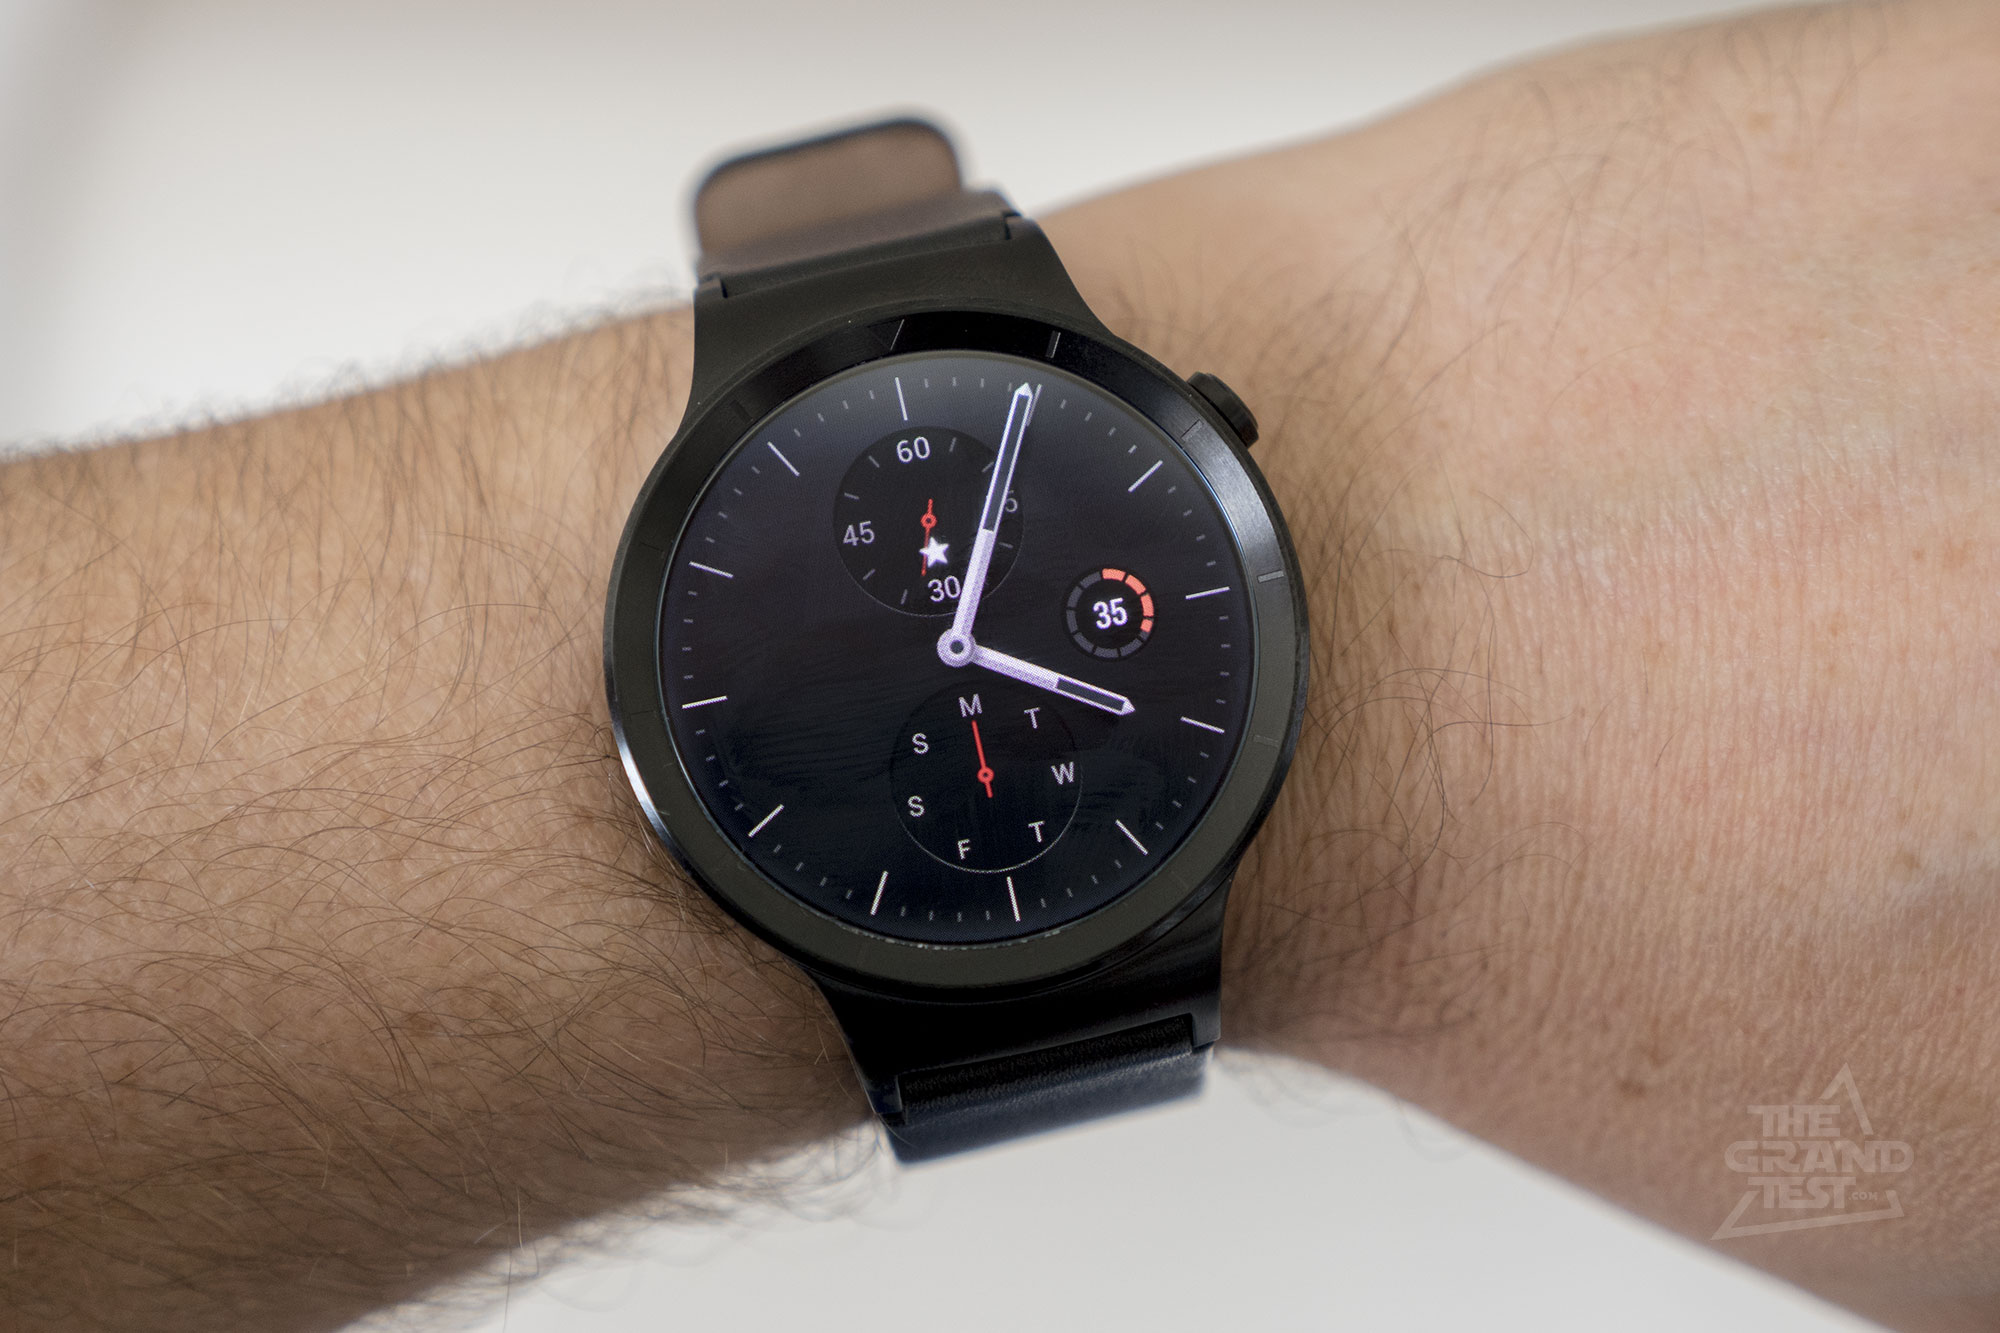 Huawei Watch : le test de la smartwatch chinoise sous ...